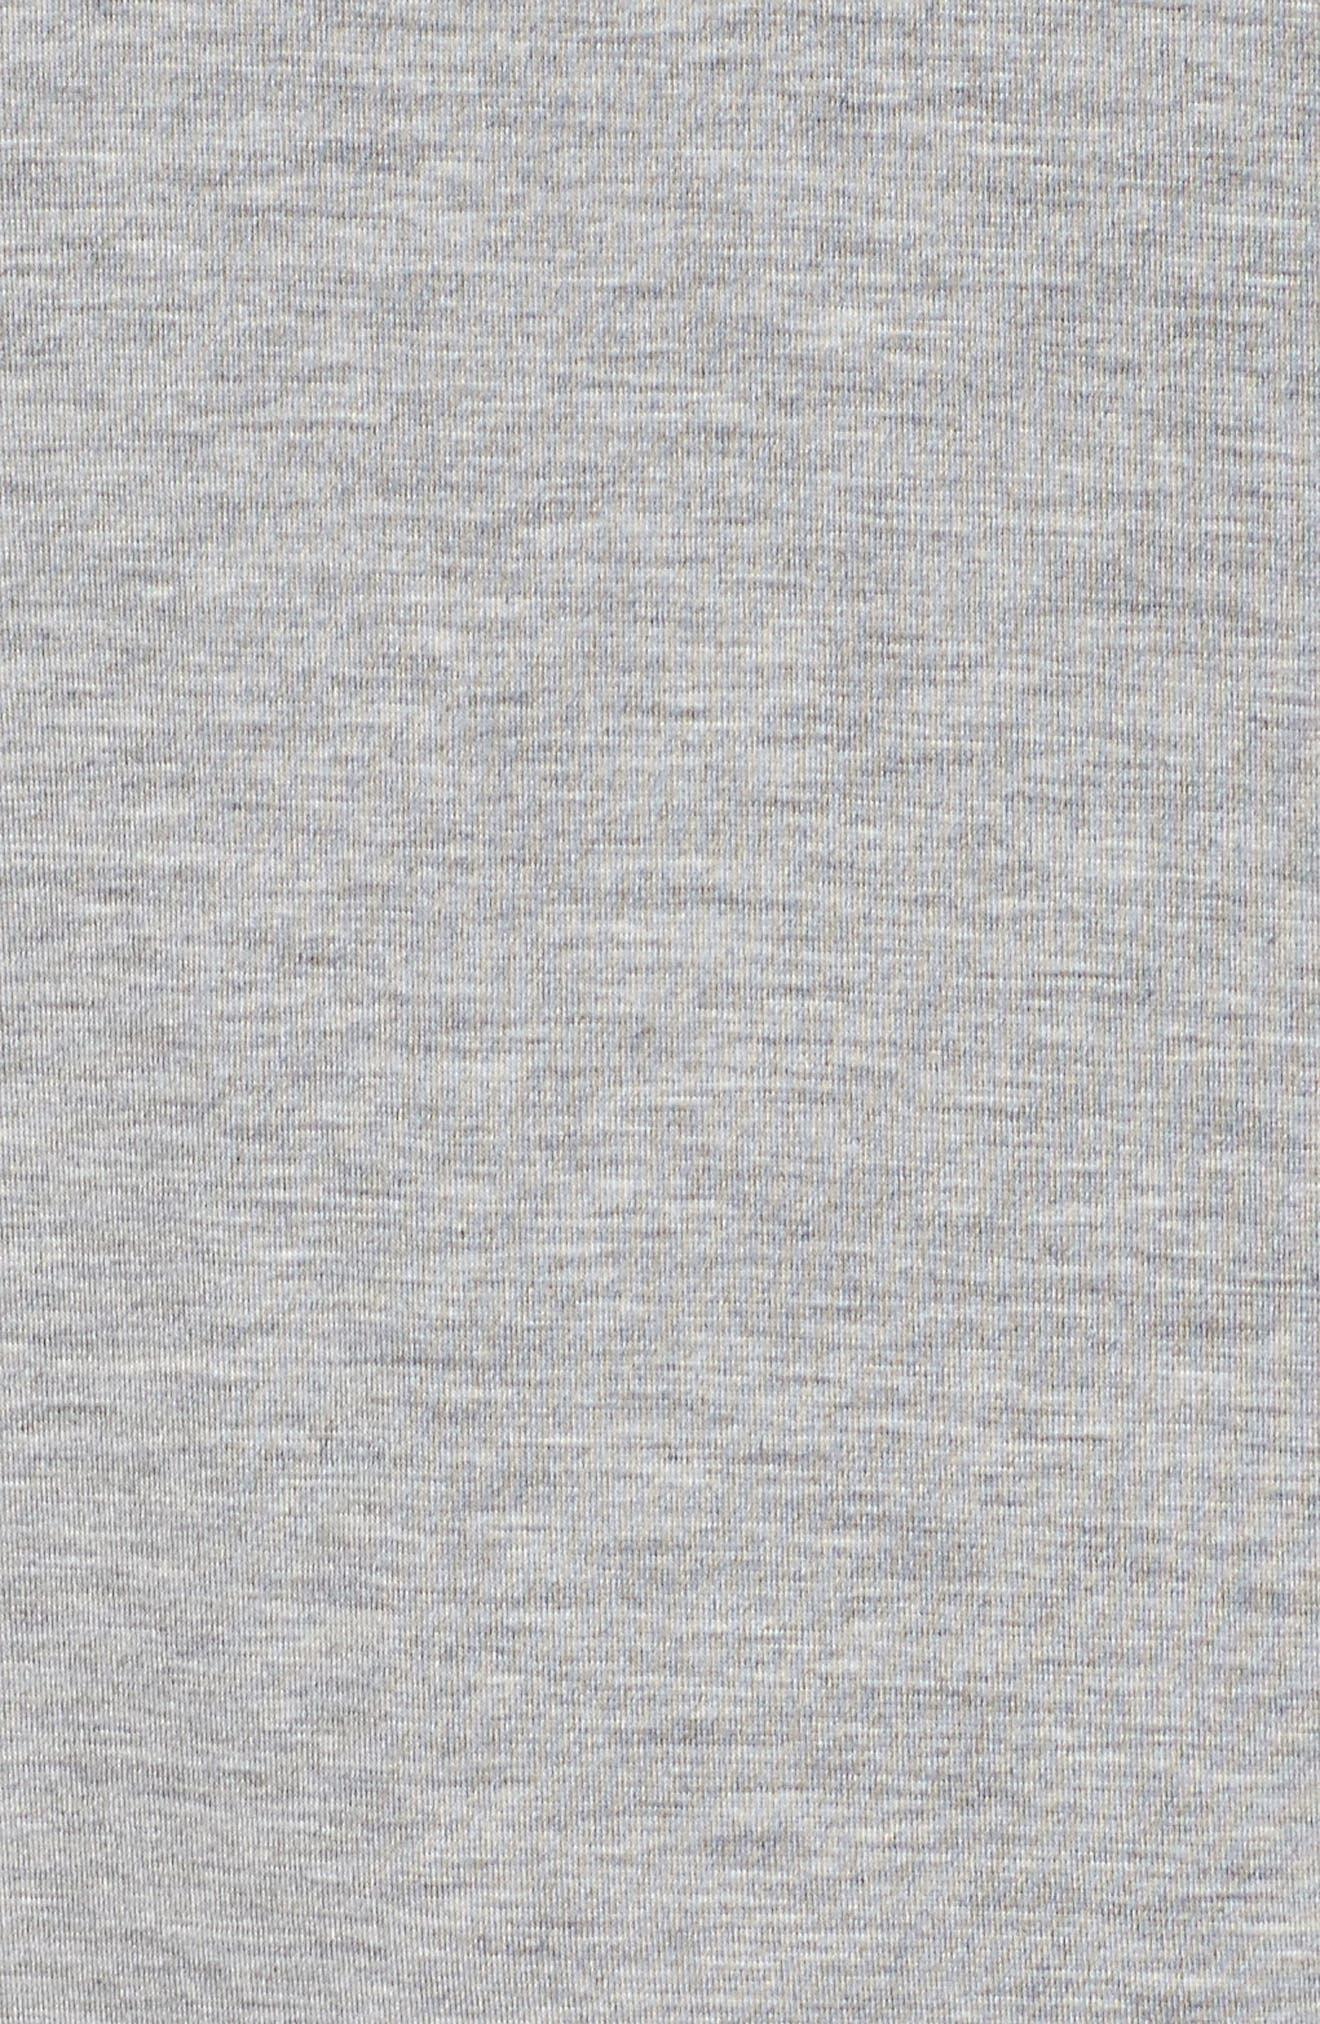 Sleep Shirt,                             Alternate thumbnail 5, color,                             Light Grey Heather